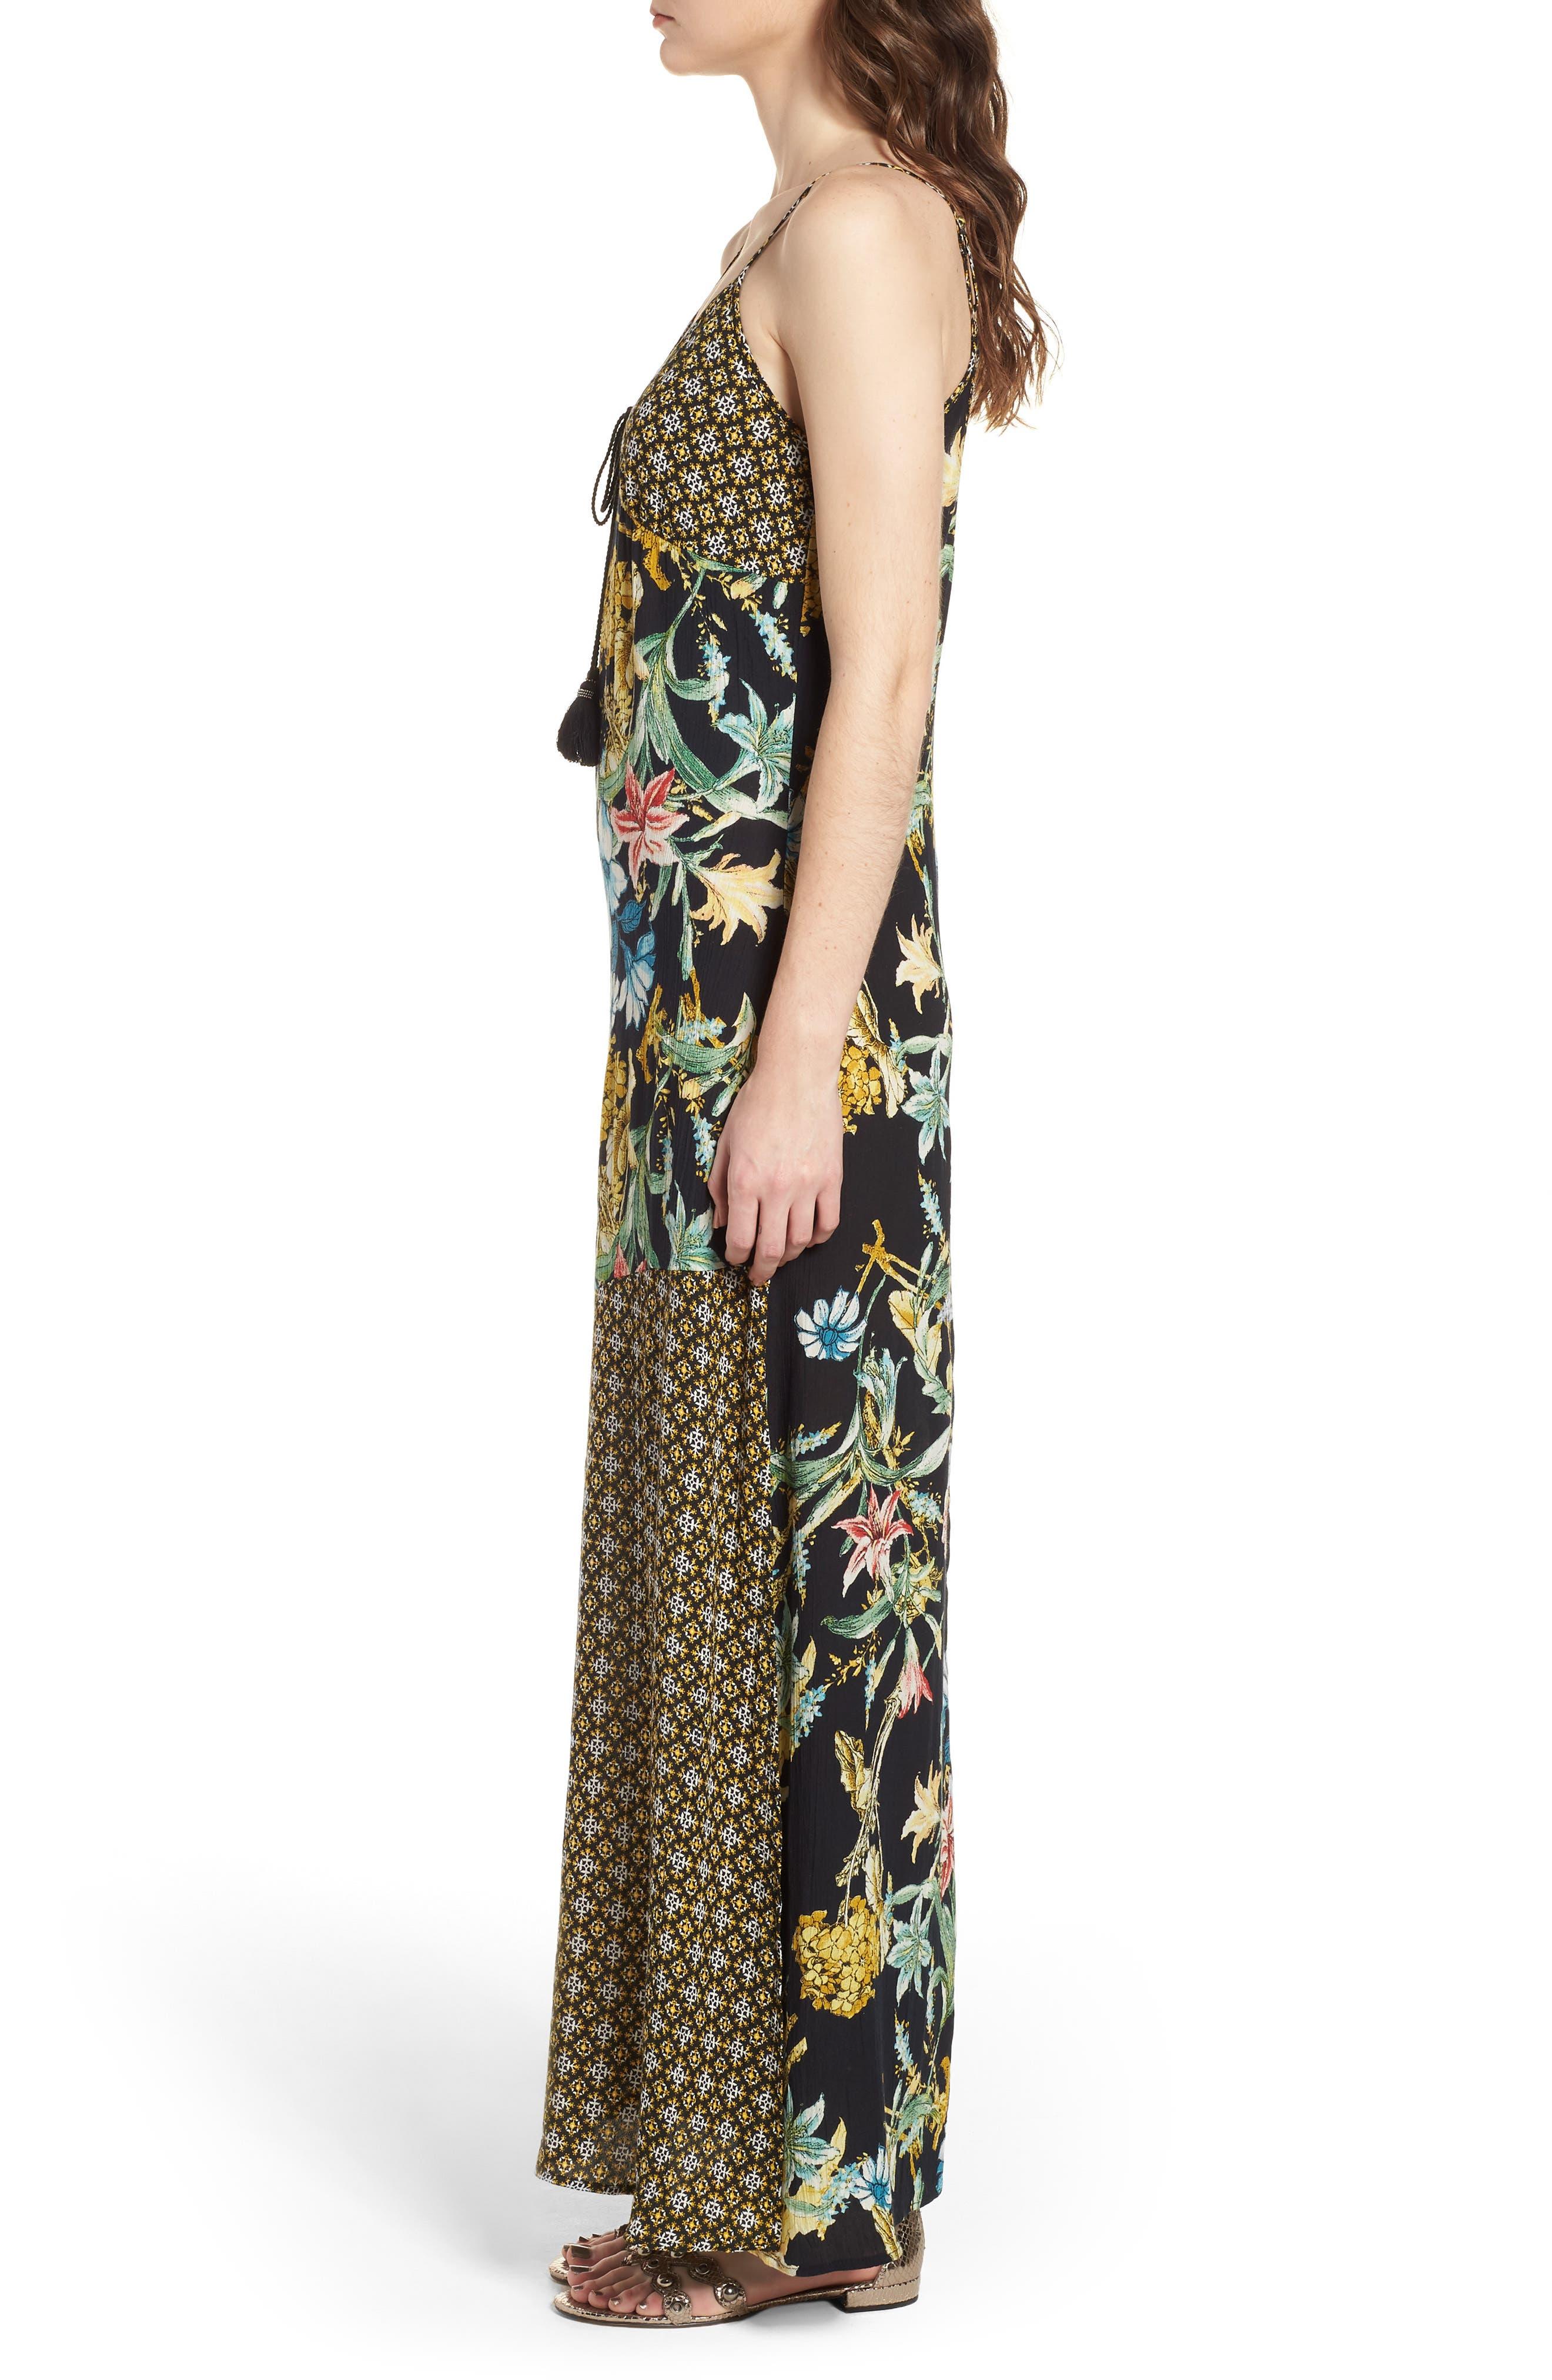 Tropical Mixed Print Maxi Dress,                             Alternate thumbnail 3, color,                             Black/ Yellow